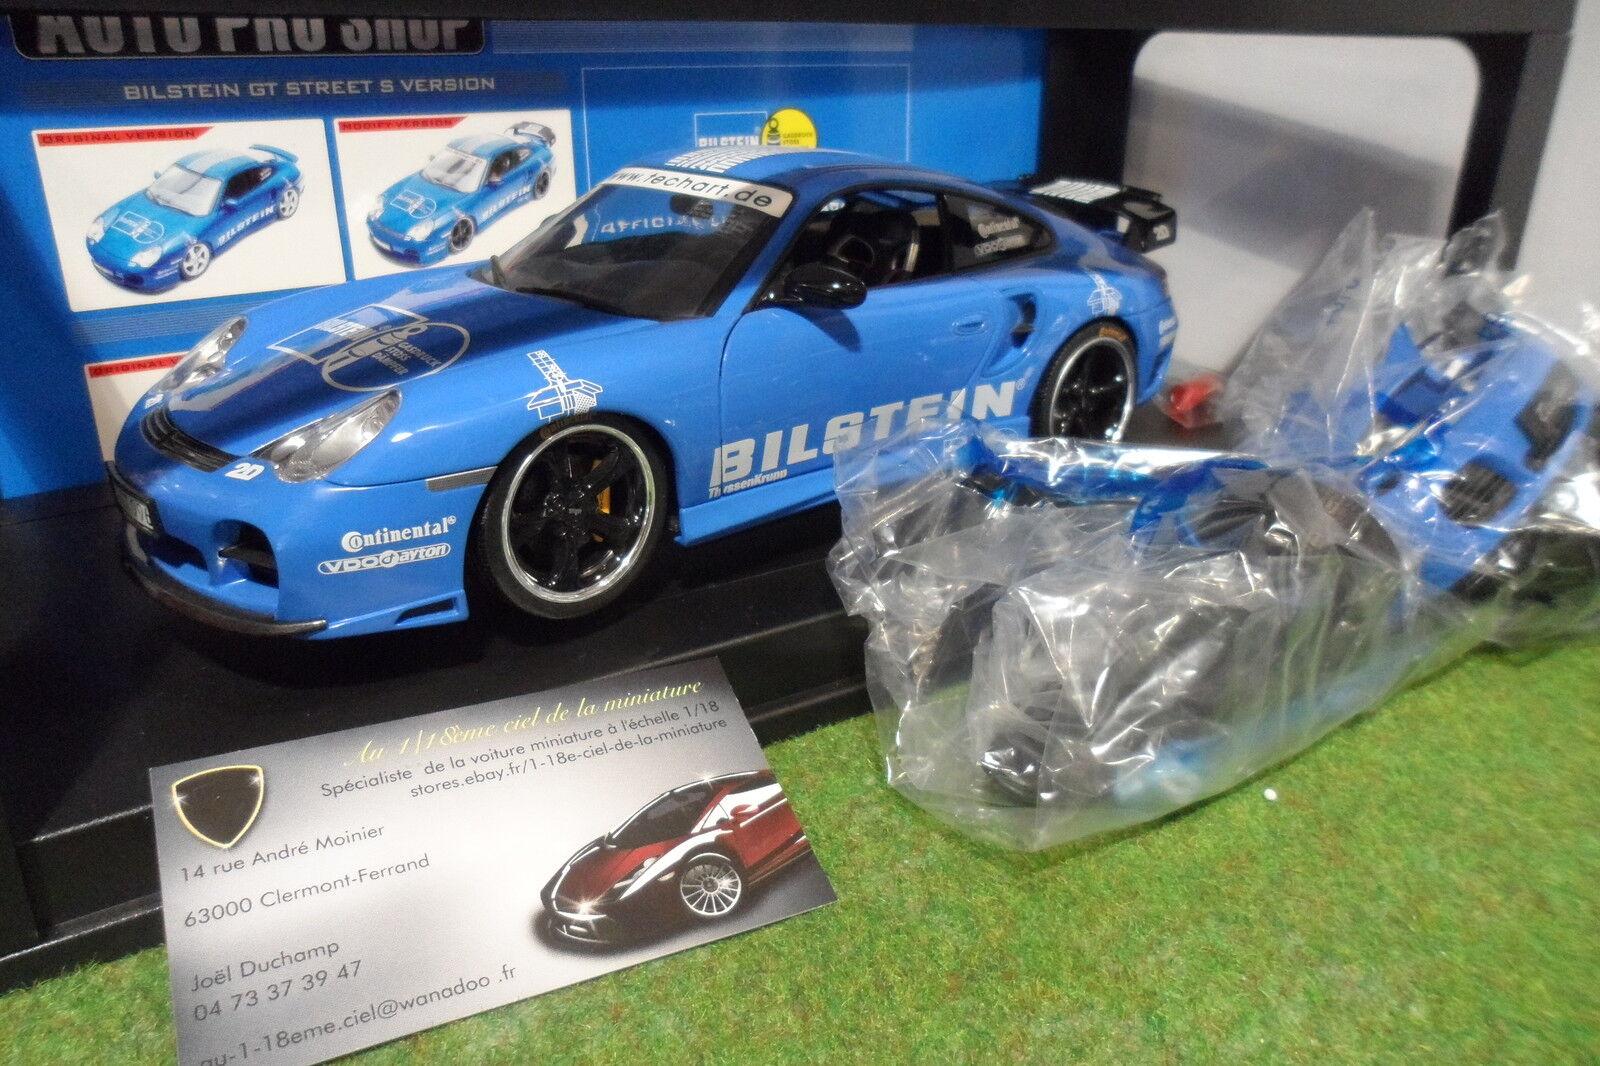 PORSCHE 911 Turbo 996 BILSTEIN o 1 18 AUTO PRO SHOP voiture miniature collection